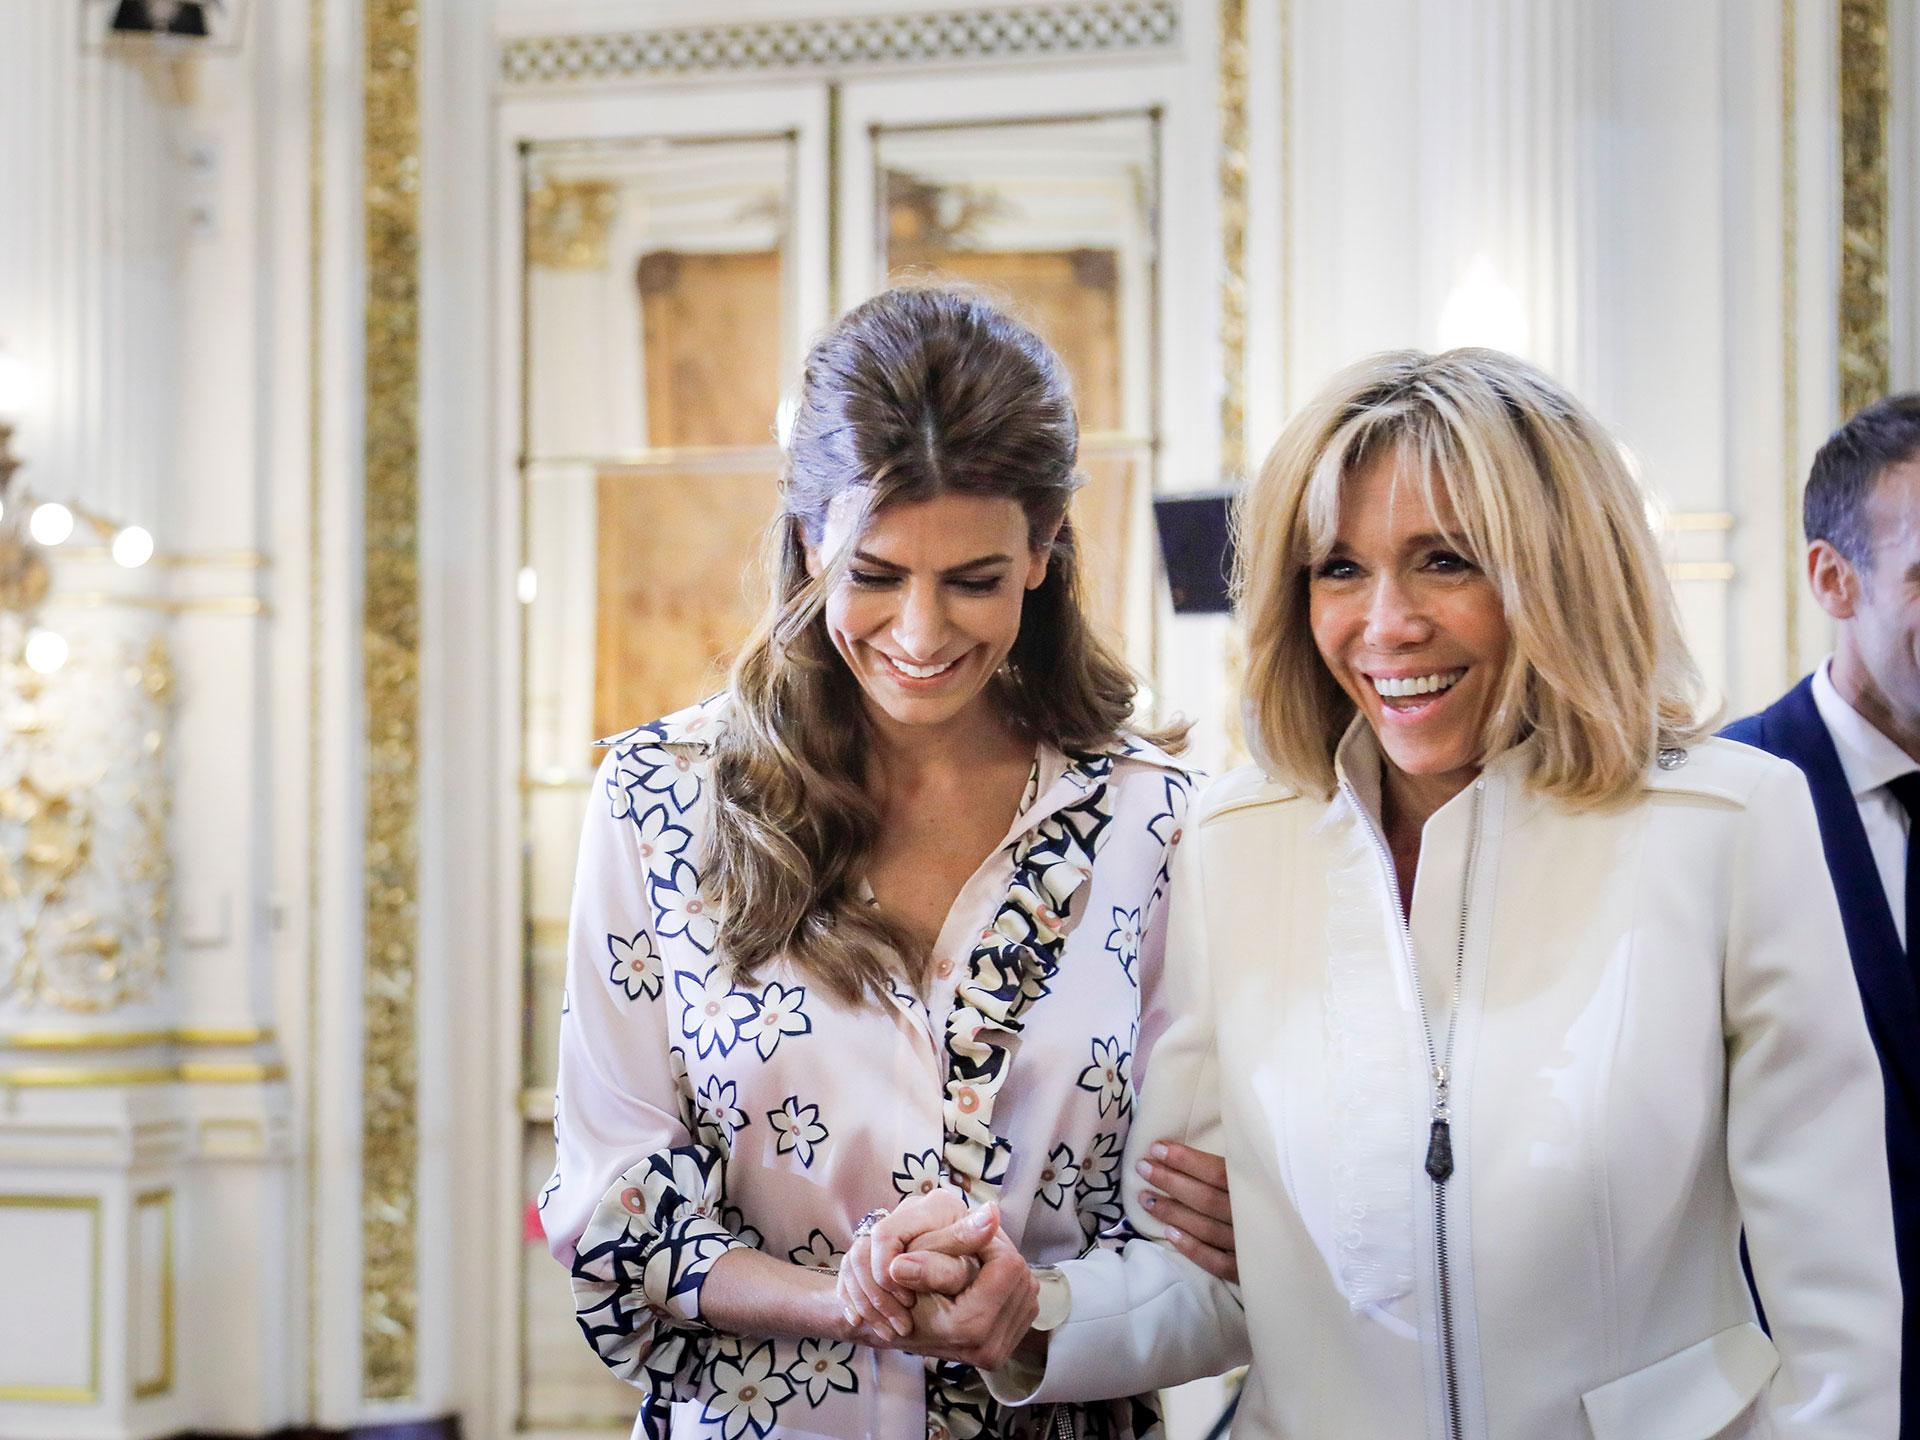 En un encuentro distendido, Juliana Awada recibió a Brigitte Macron